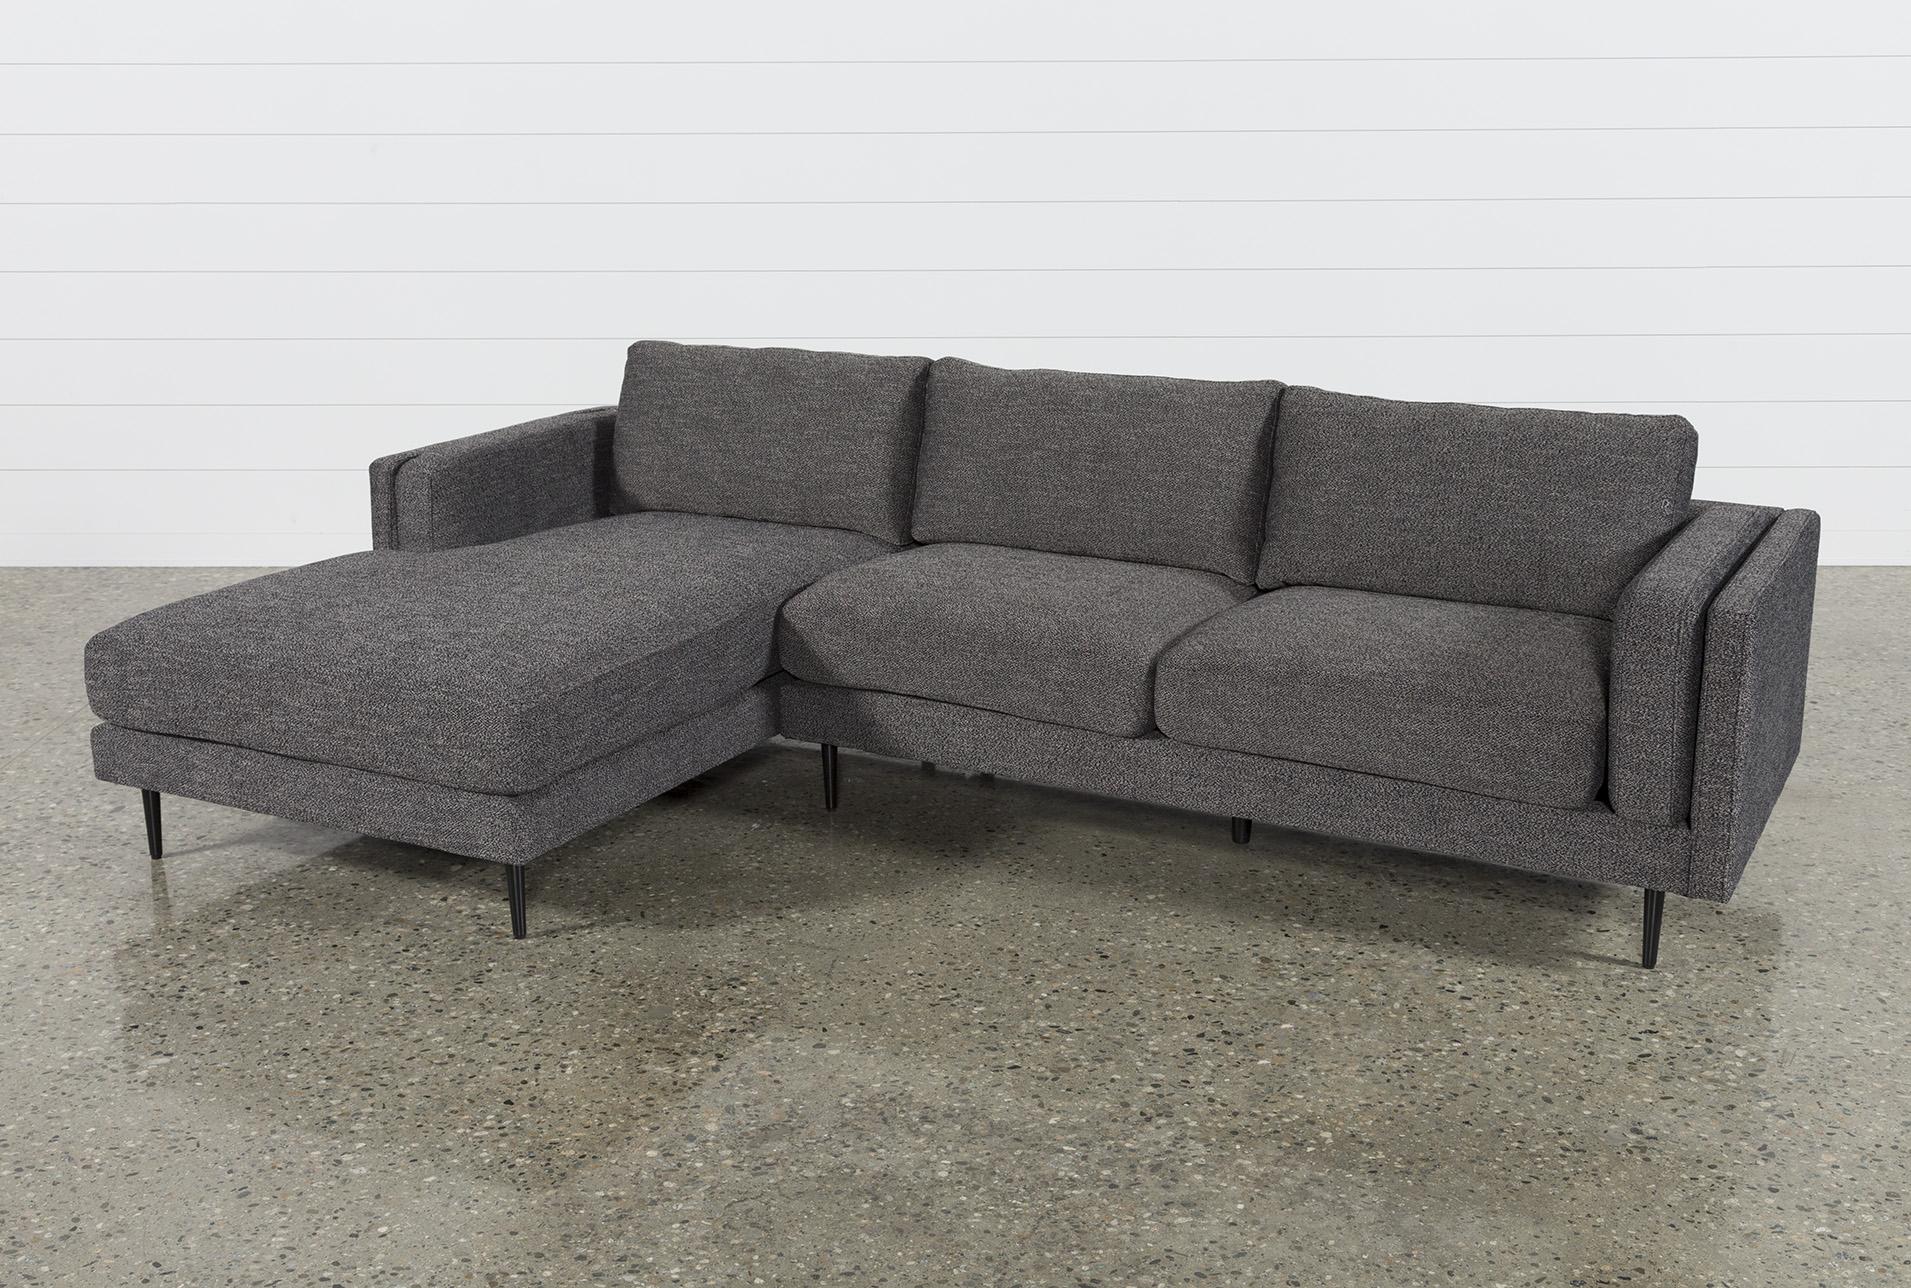 Aquarius Dark Grey 2 Piece Sectional W/laf Chaise In 2018 | Products In Aquarius Dark Grey Sofa Chairs (View 4 of 20)